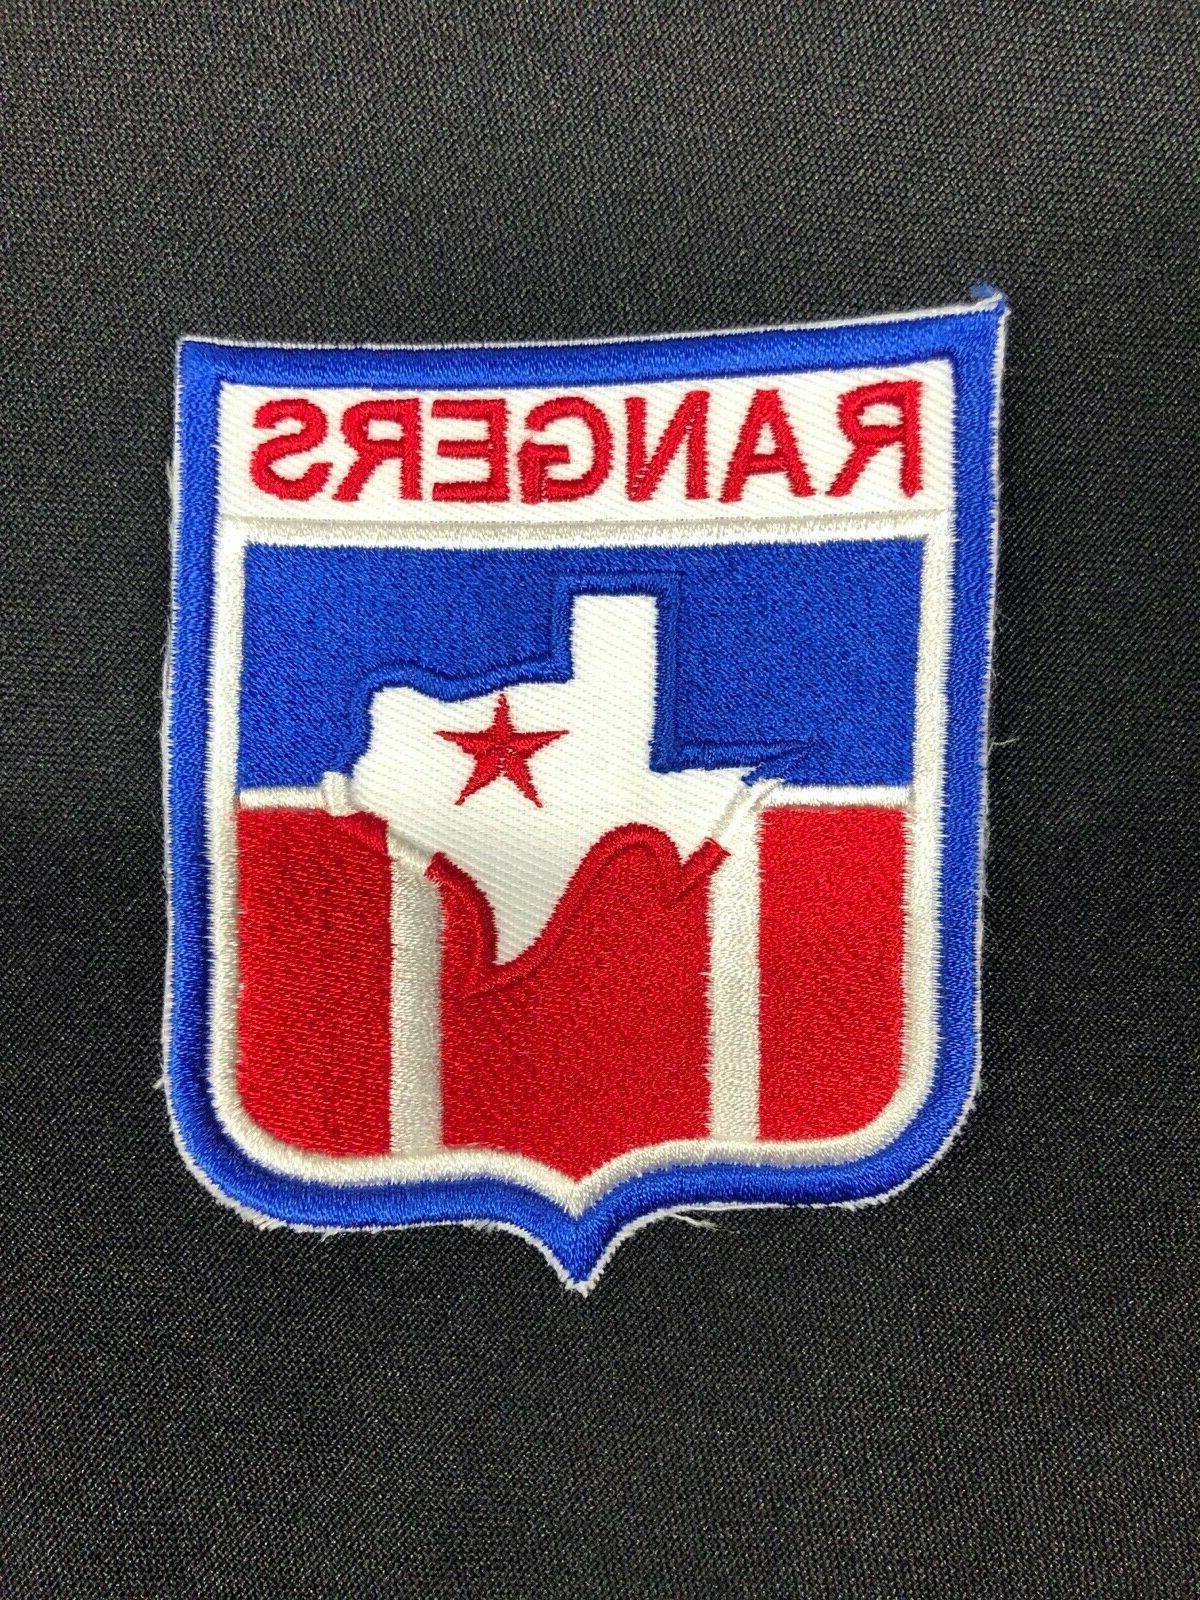 texas rangers replica jersey sleeve patch 1977